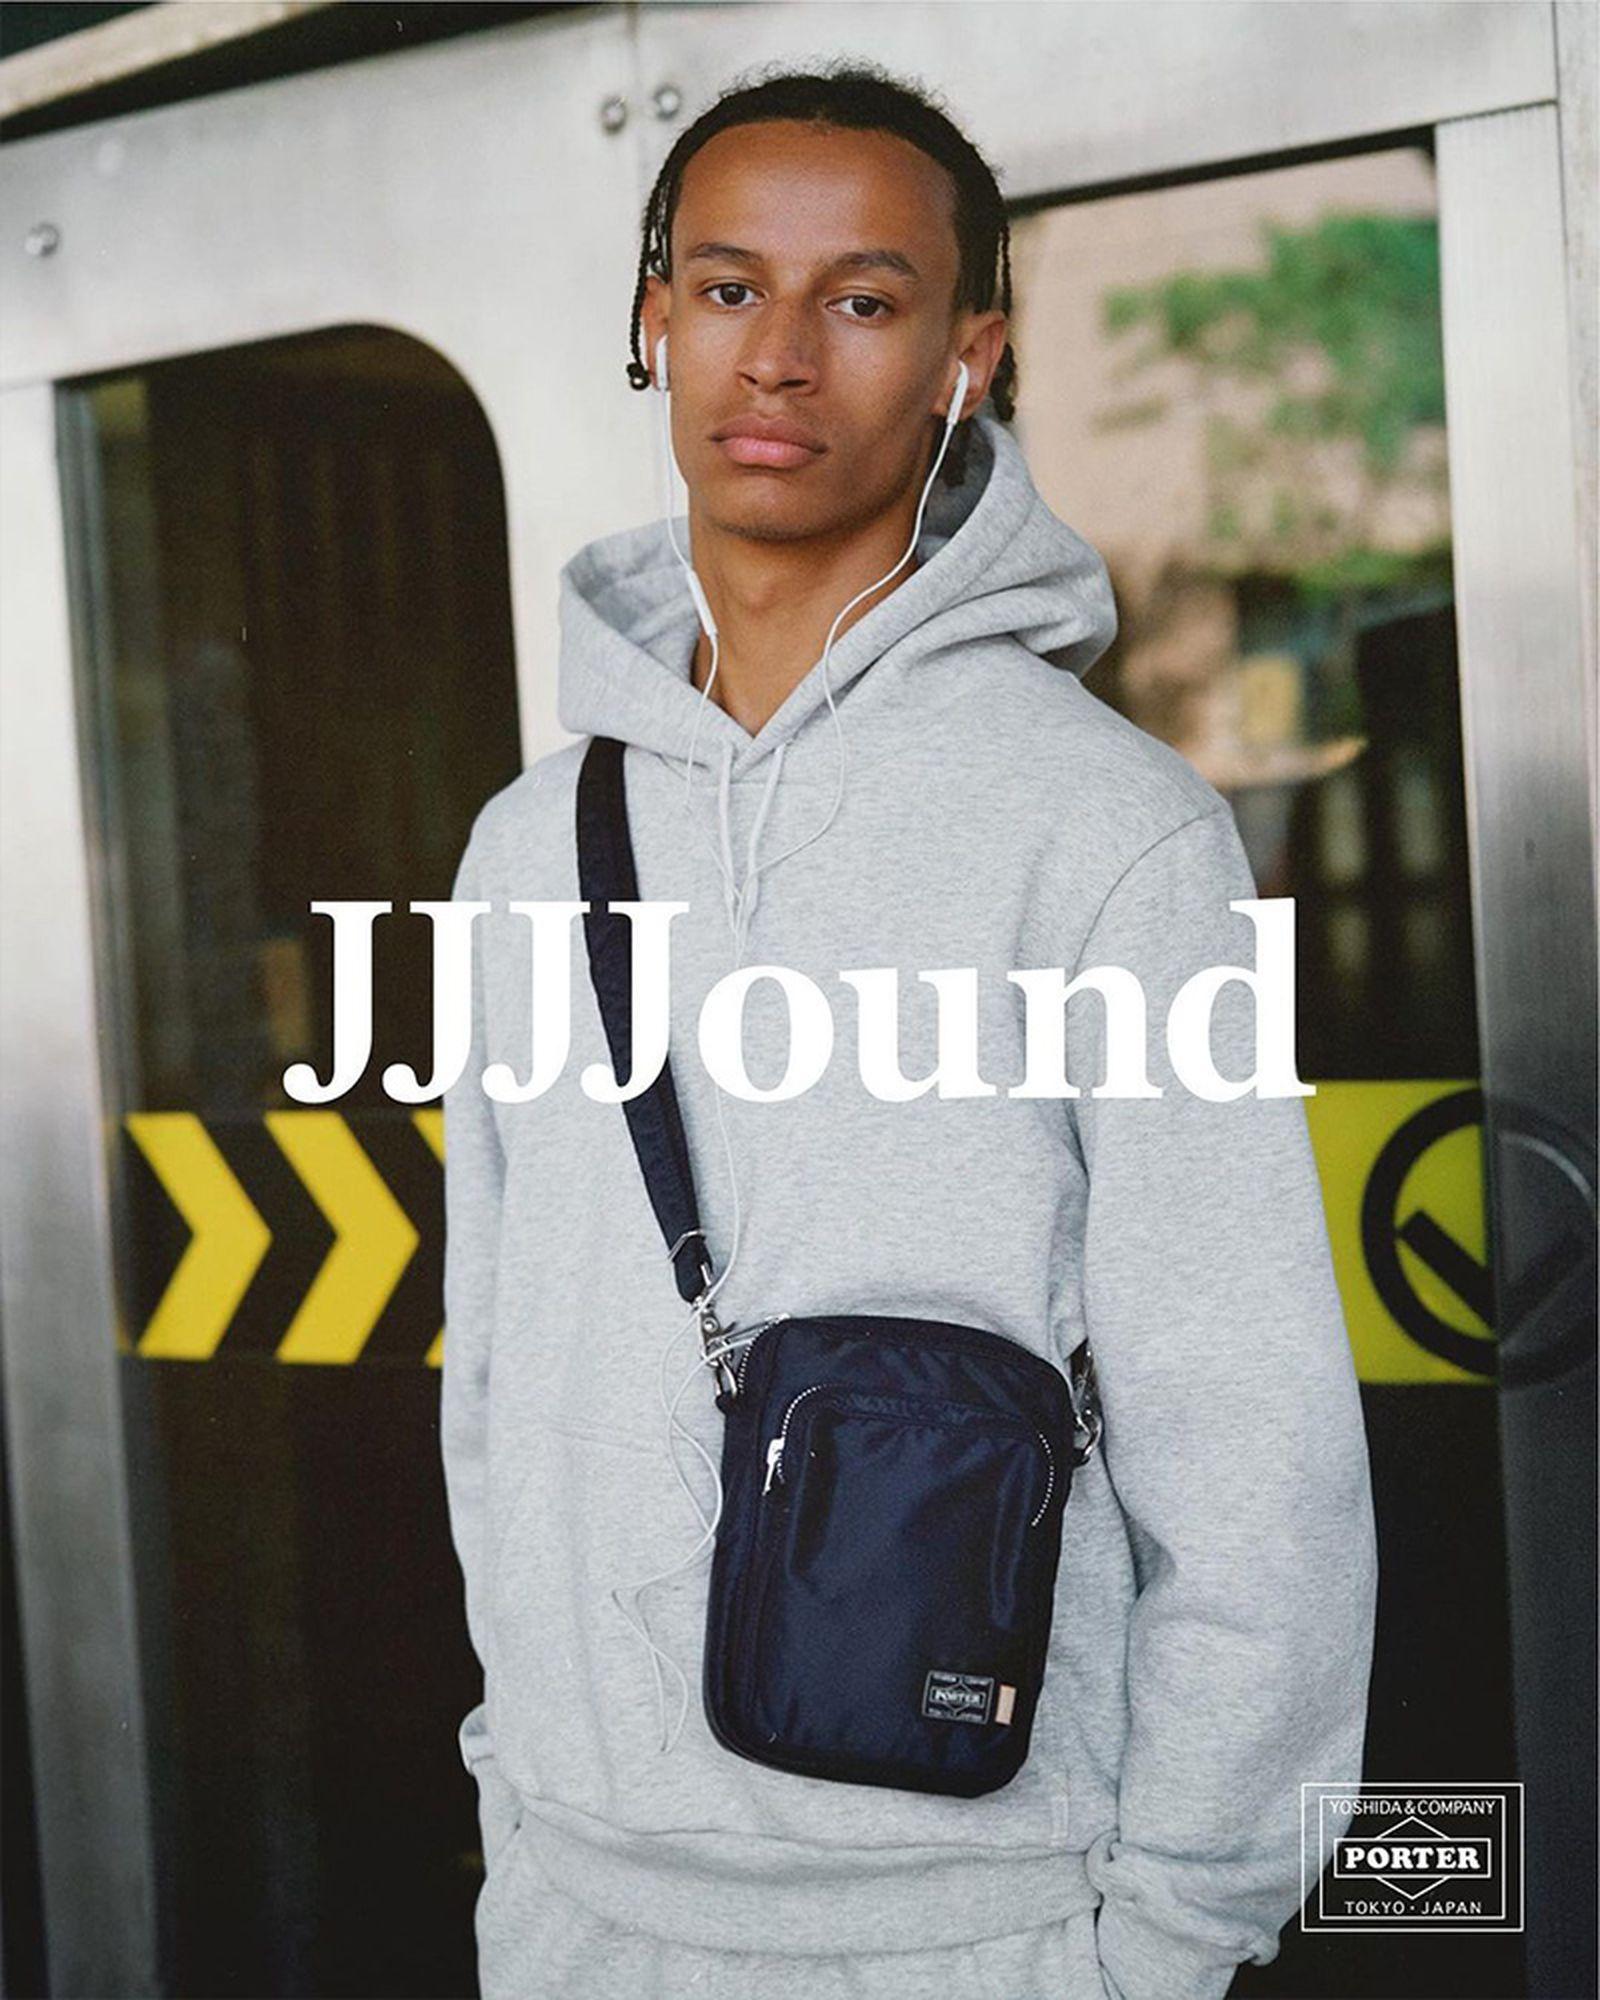 jjjjound-porter-bags-release-date-info-02